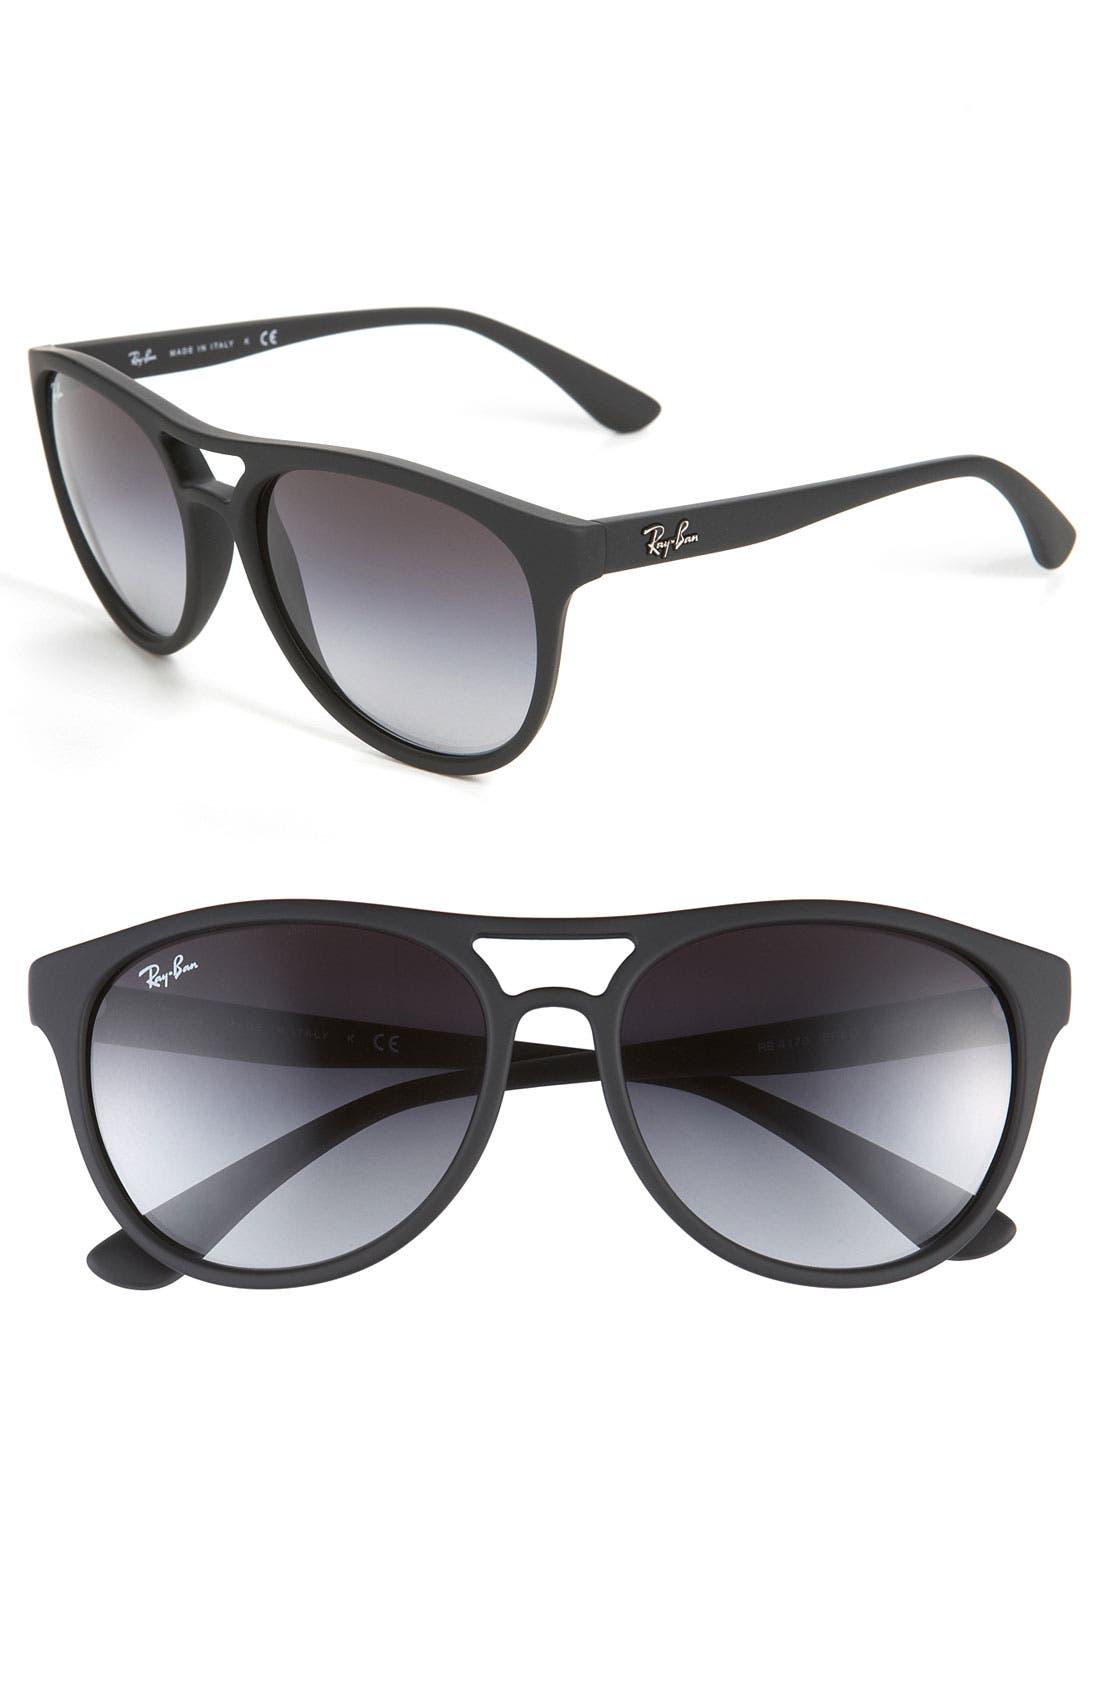 Main Image - Ray-Ban 'Wayfarer' 58mm Sunglasses